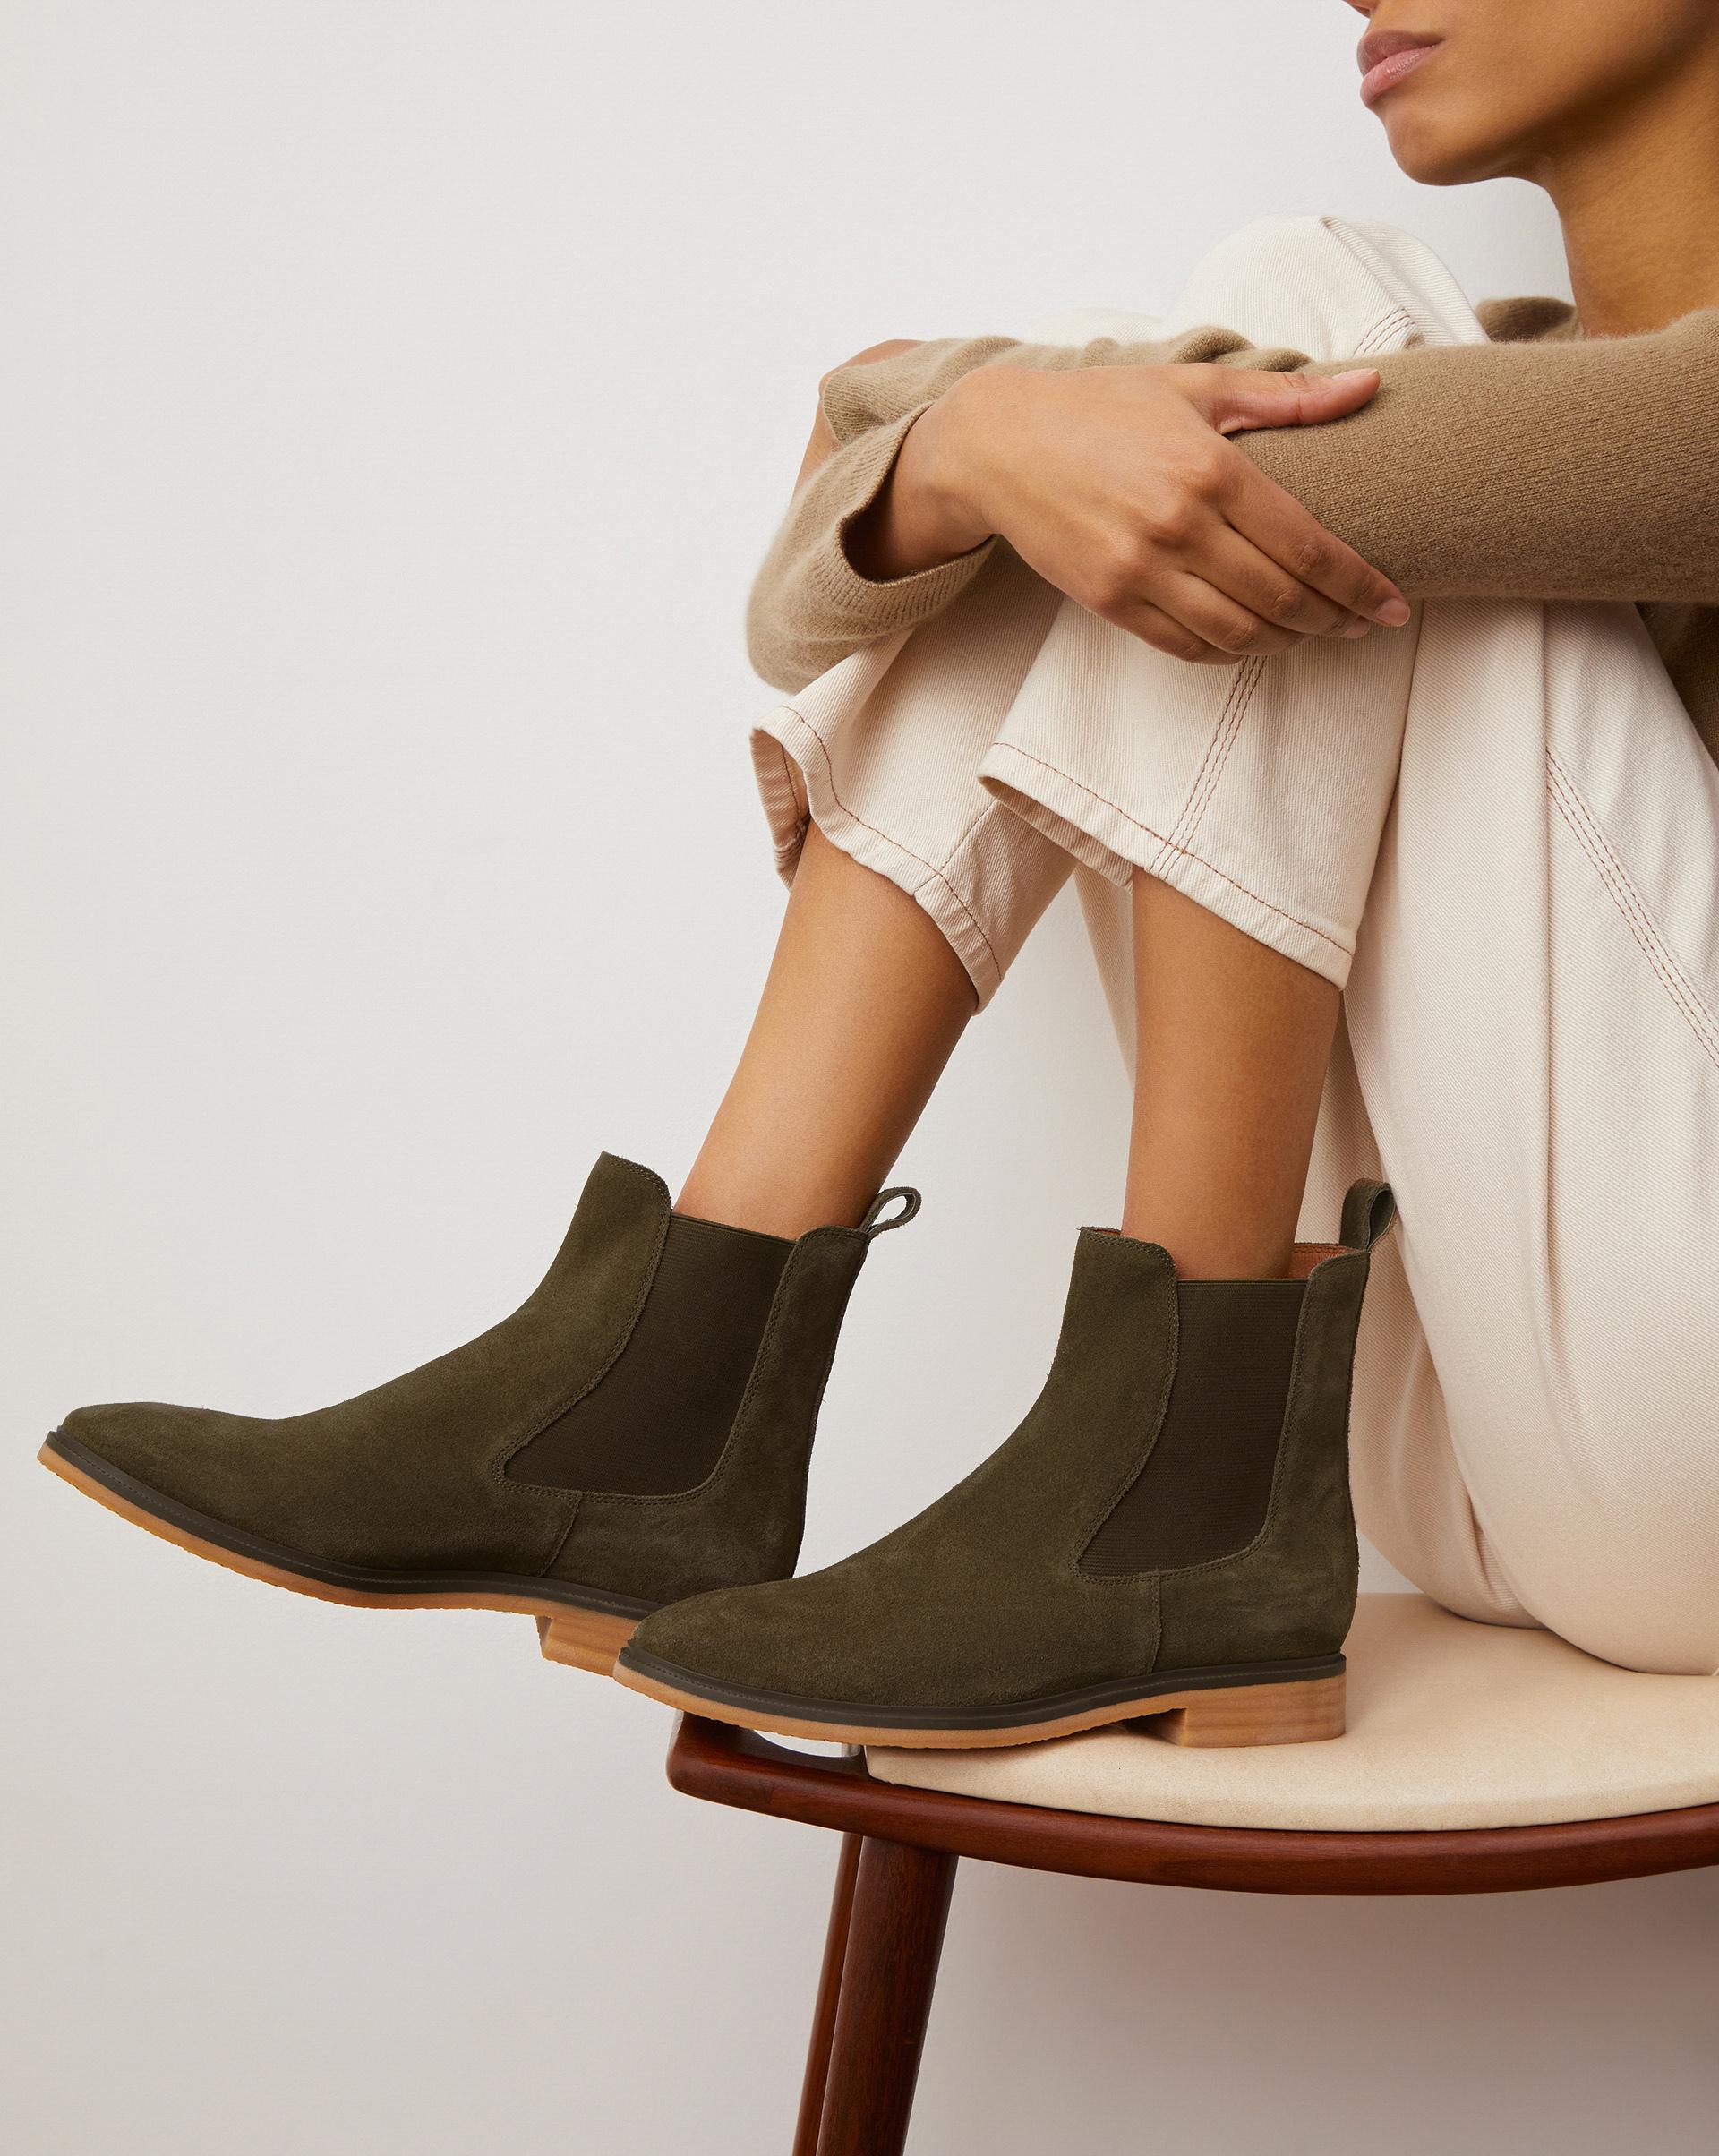 12⠀STOREEZ Ботинки челси на каучуковой подошве фото